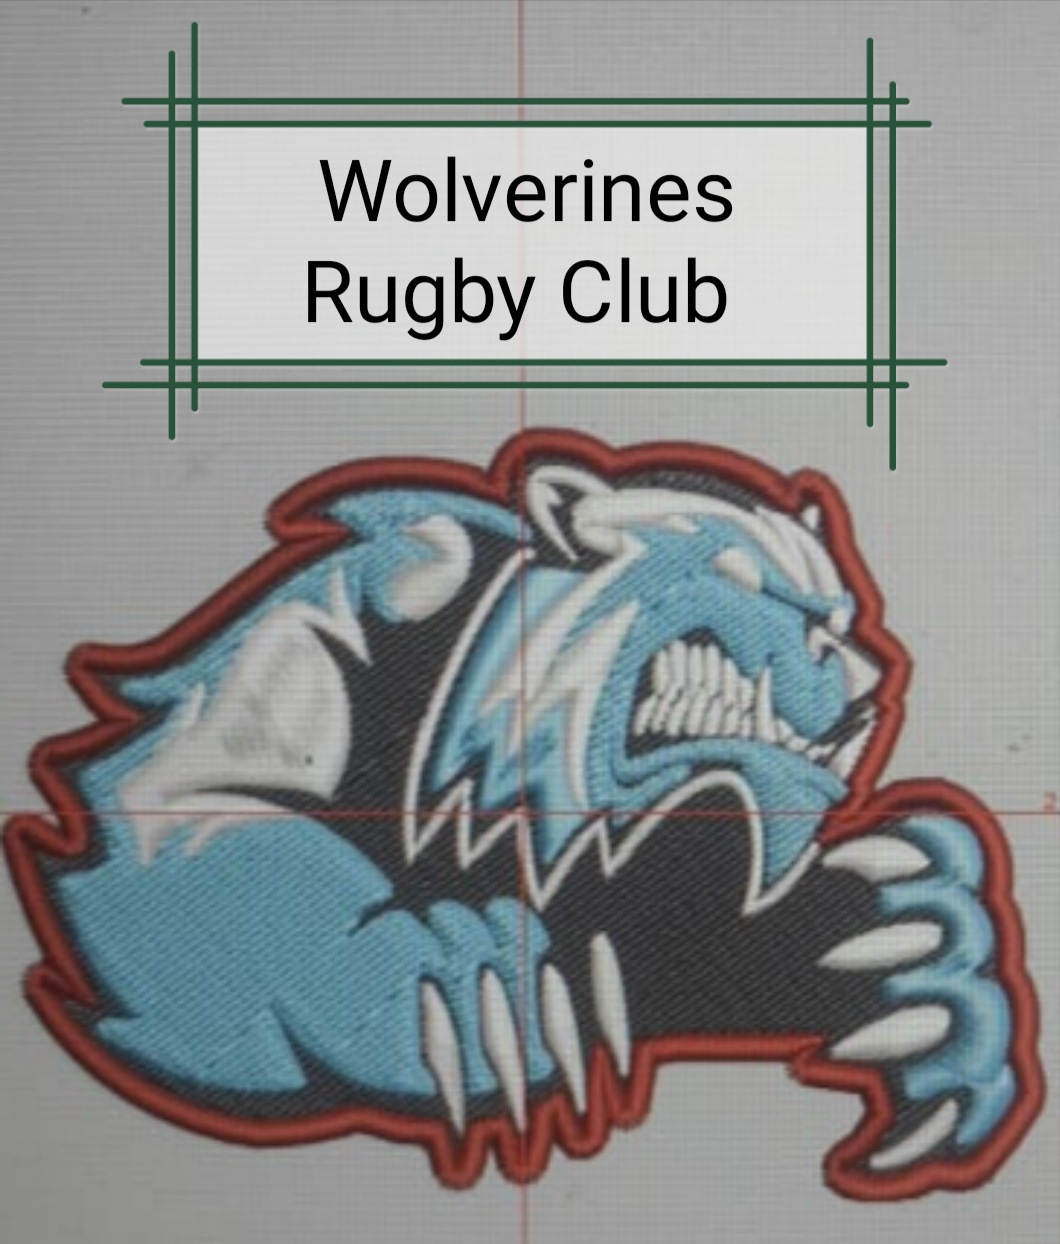 Wolverines Rugby Club